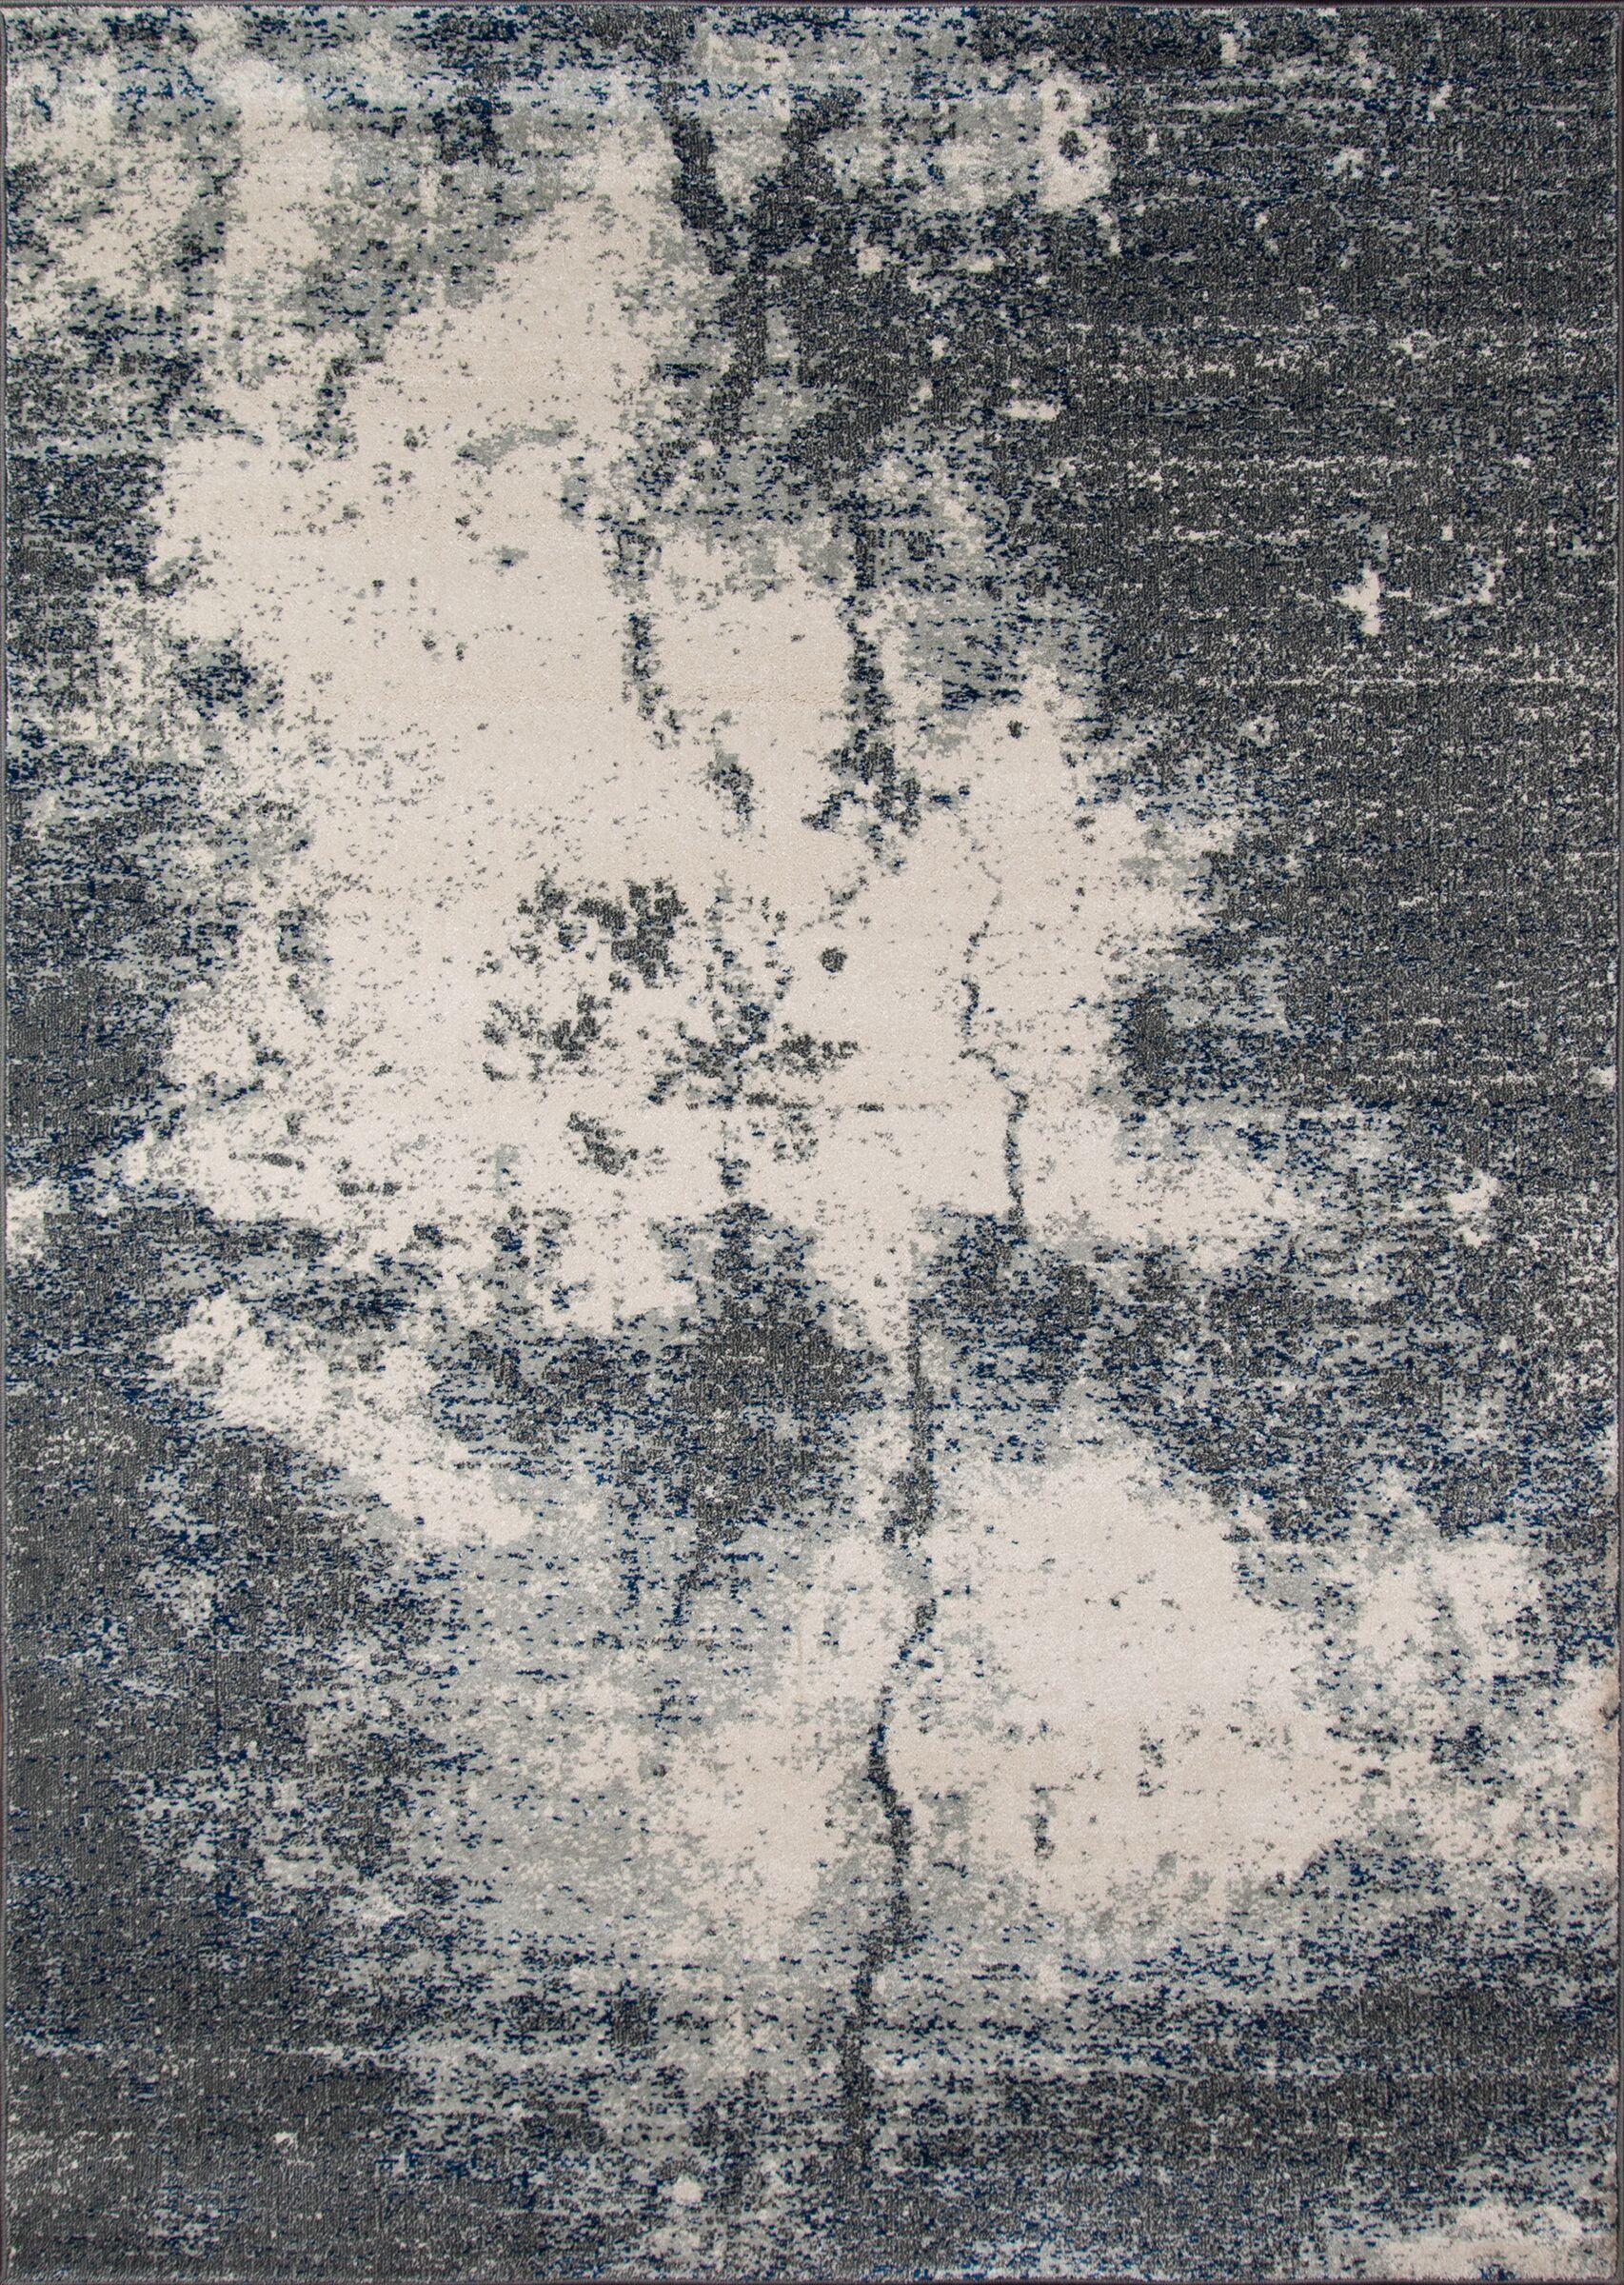 Silcox Gray Area Rug Rug Size: Rectangle 5'3